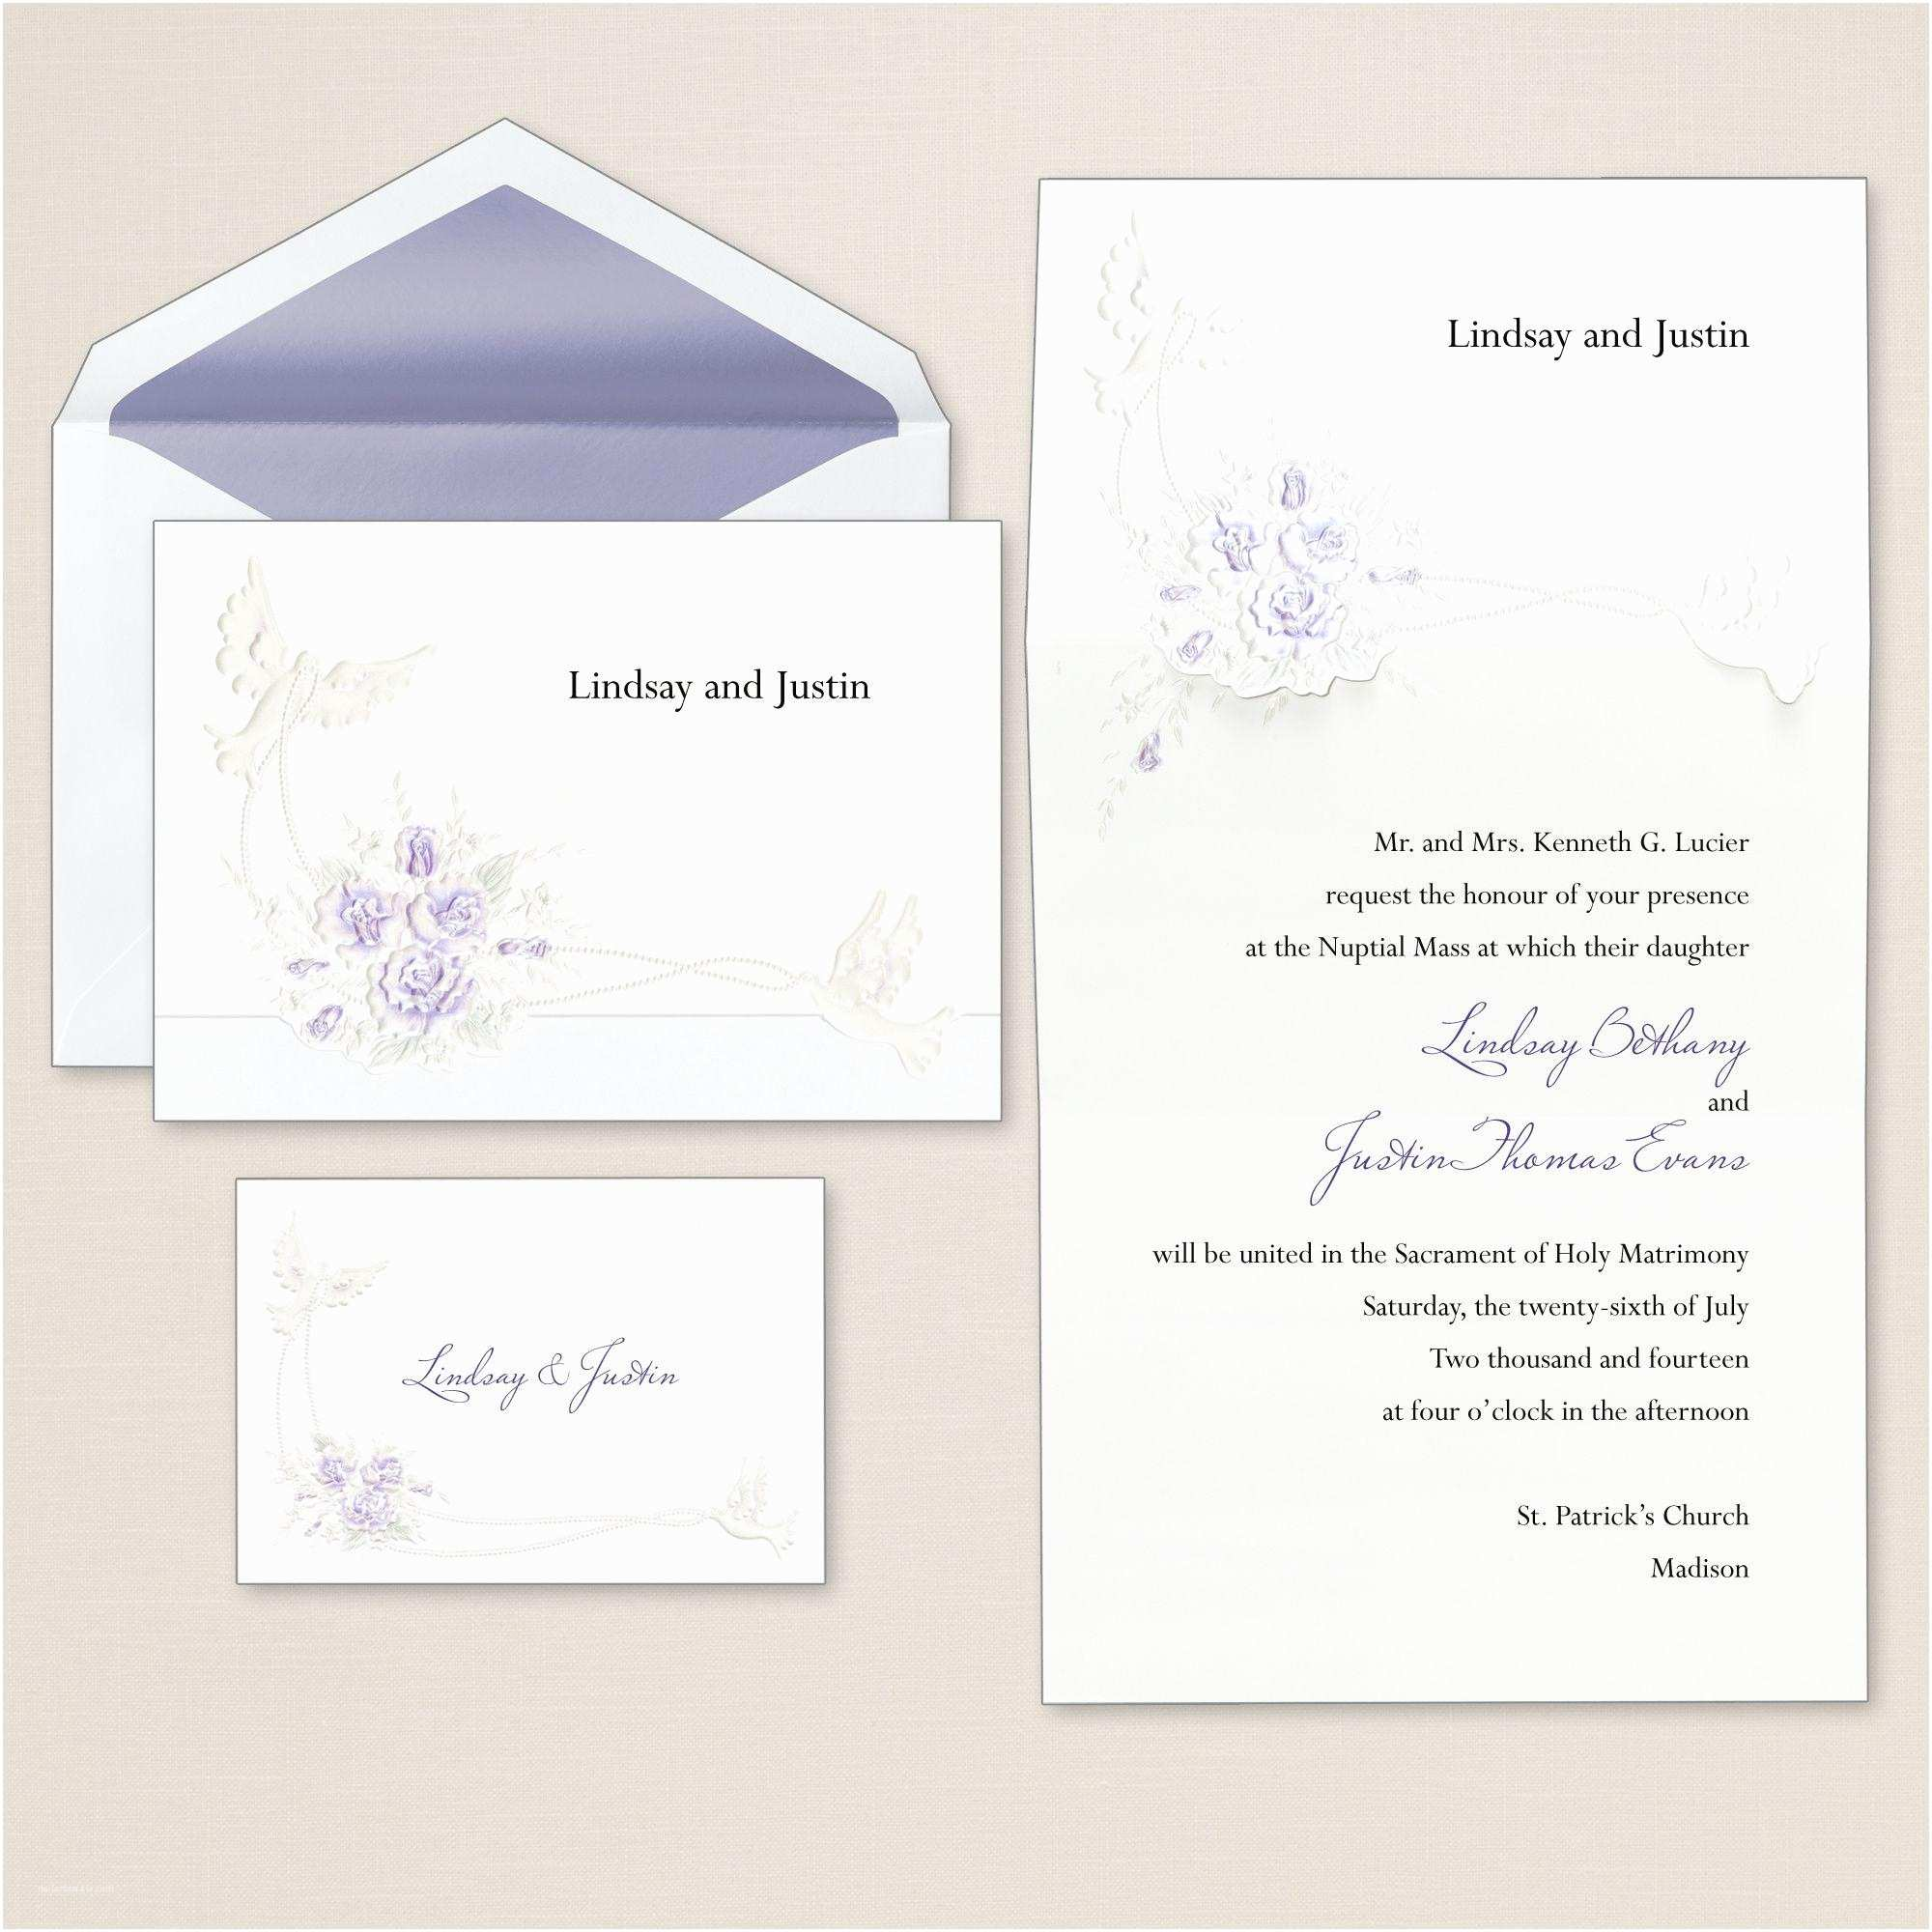 Wedding Invitation Response Wedding Invitation Response Card Wording Various